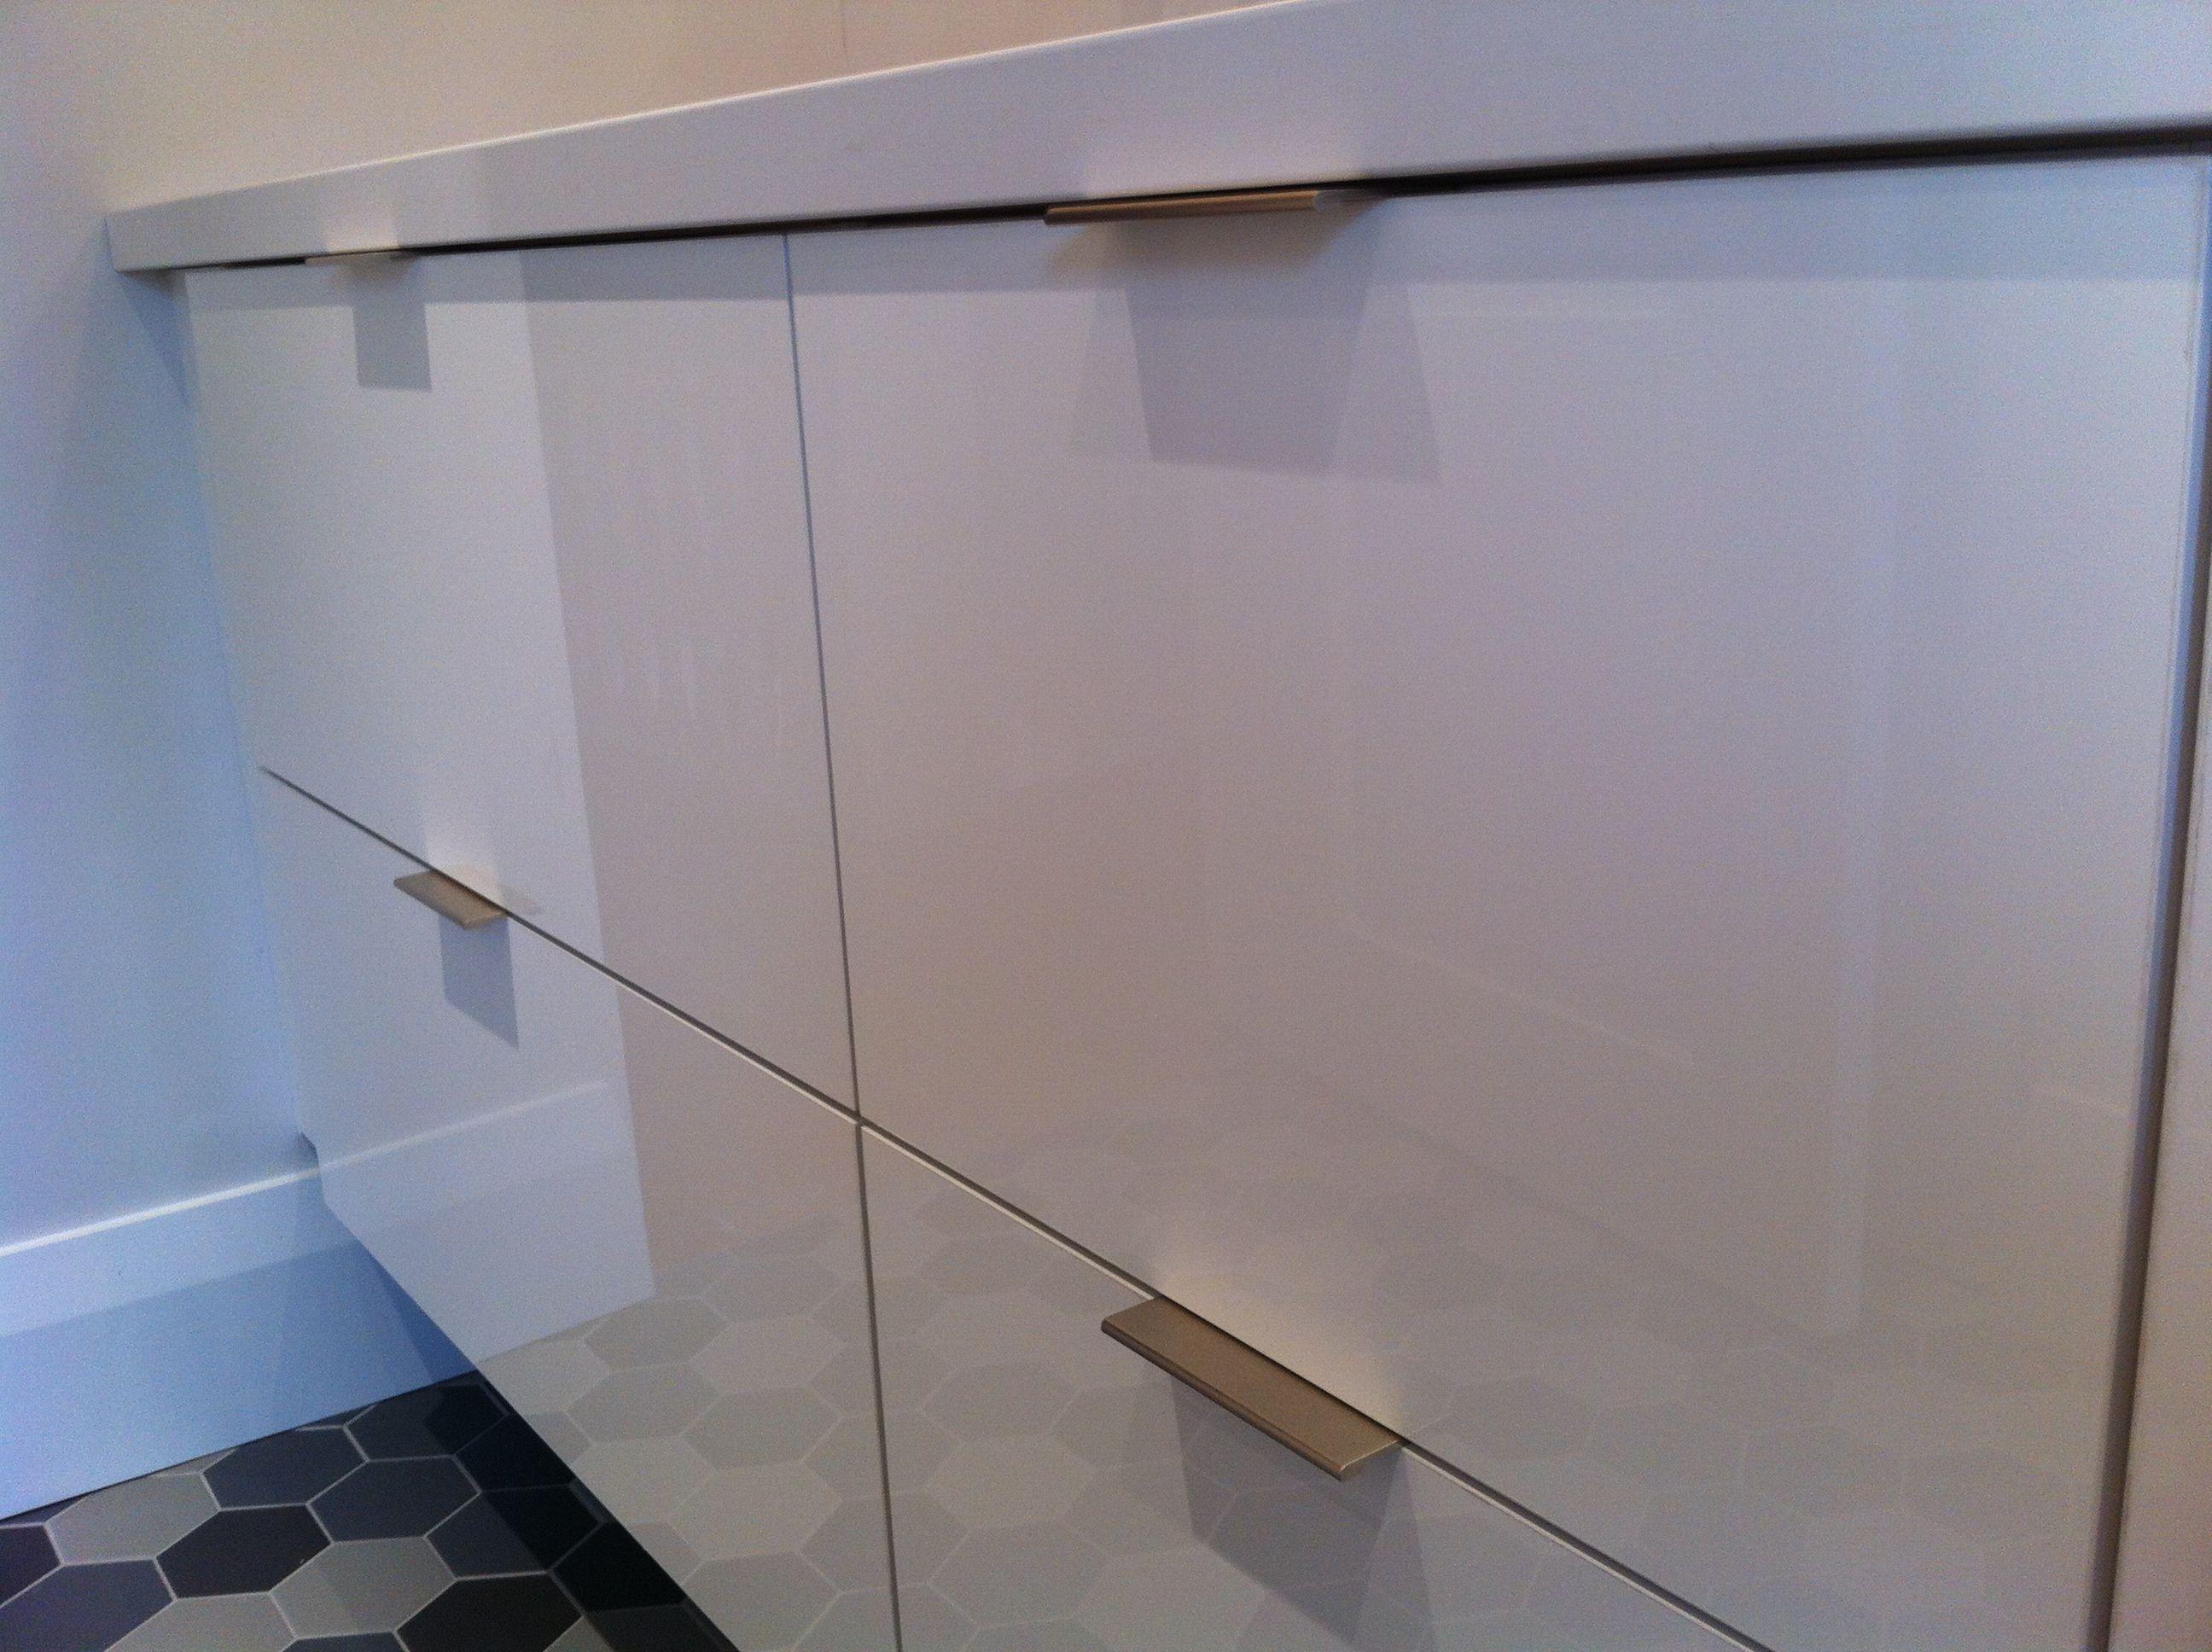 AYA Cabinets, High Gloss in White